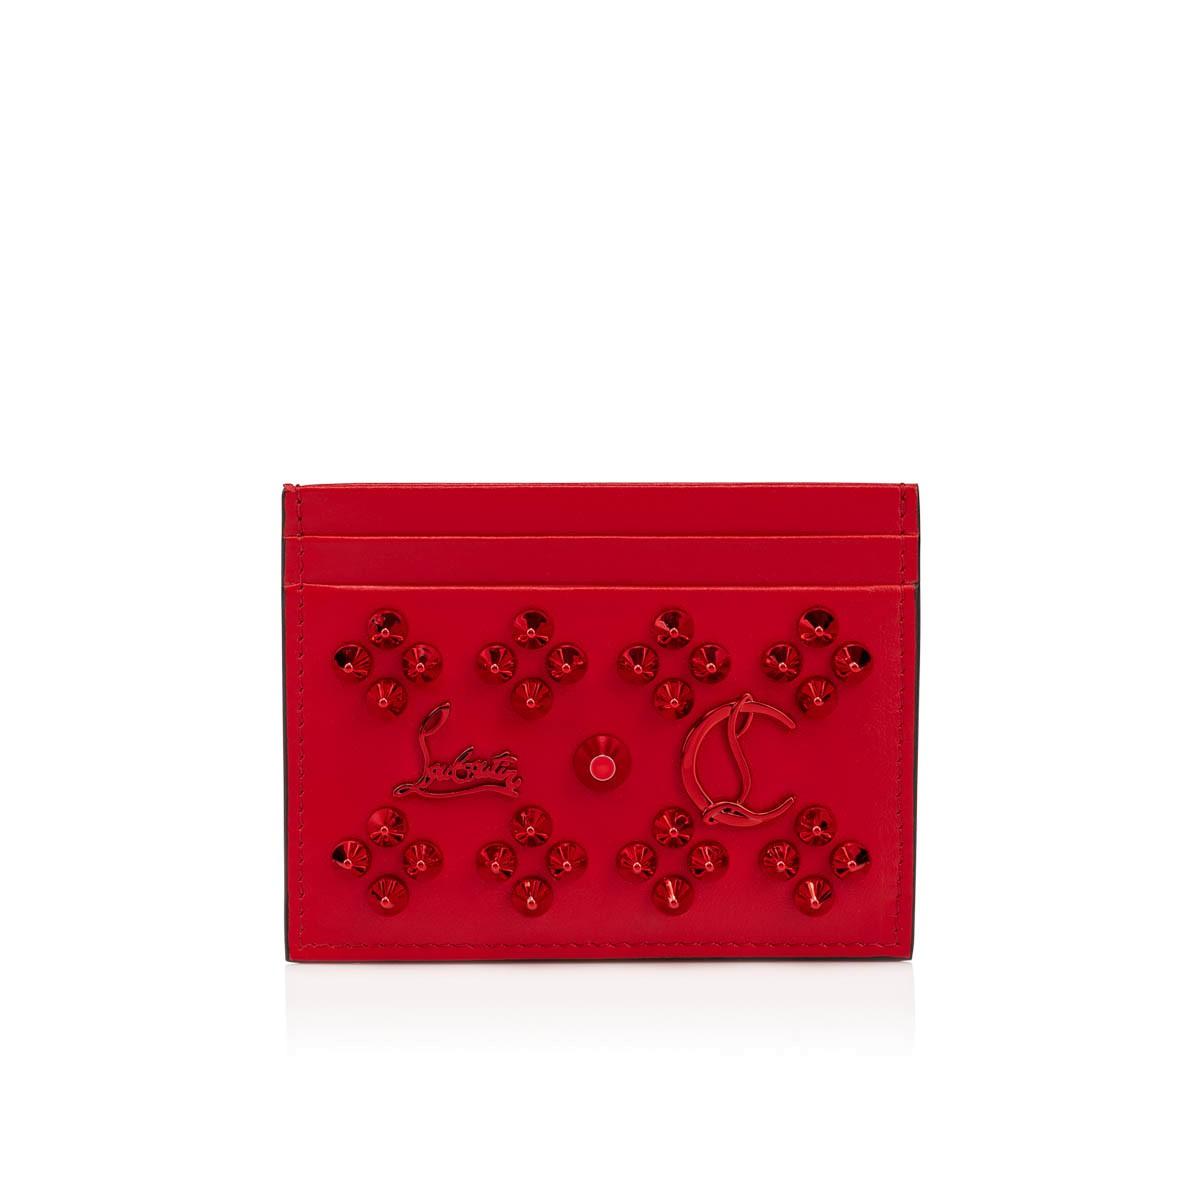 Small Leather Goods - Kios Card Holder - Christian Louboutin